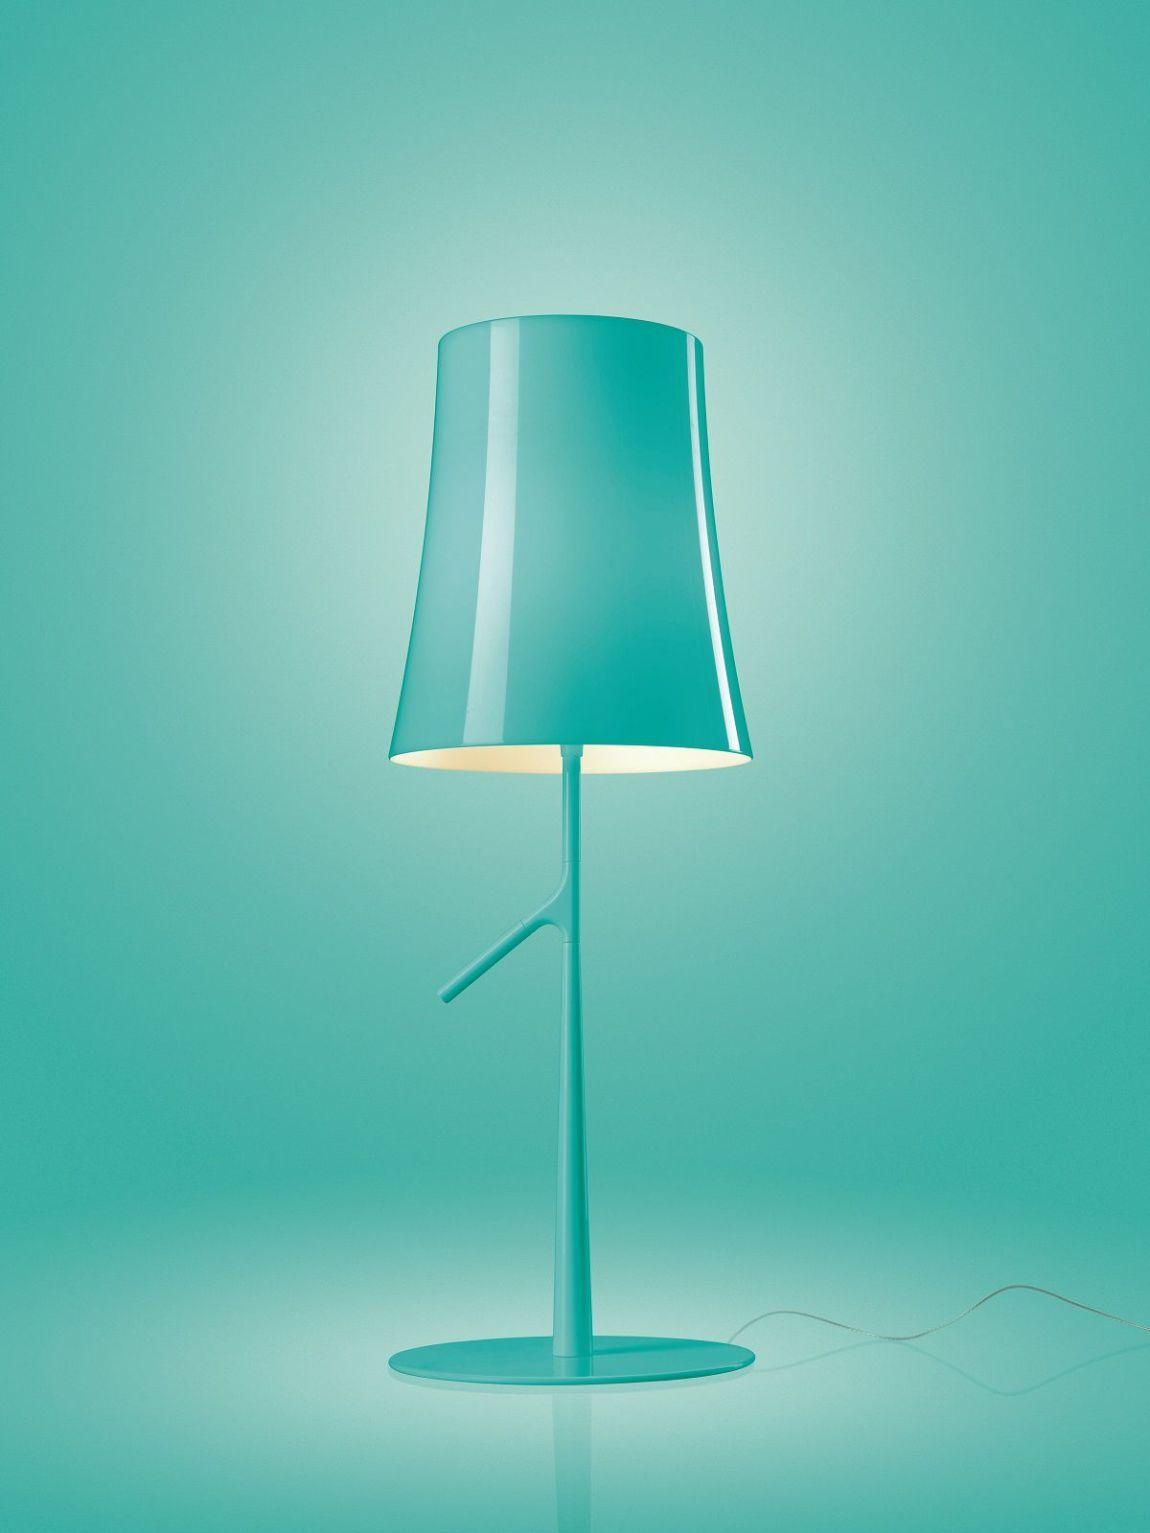 Foscarini_Birdie lampada tavolo_turchese